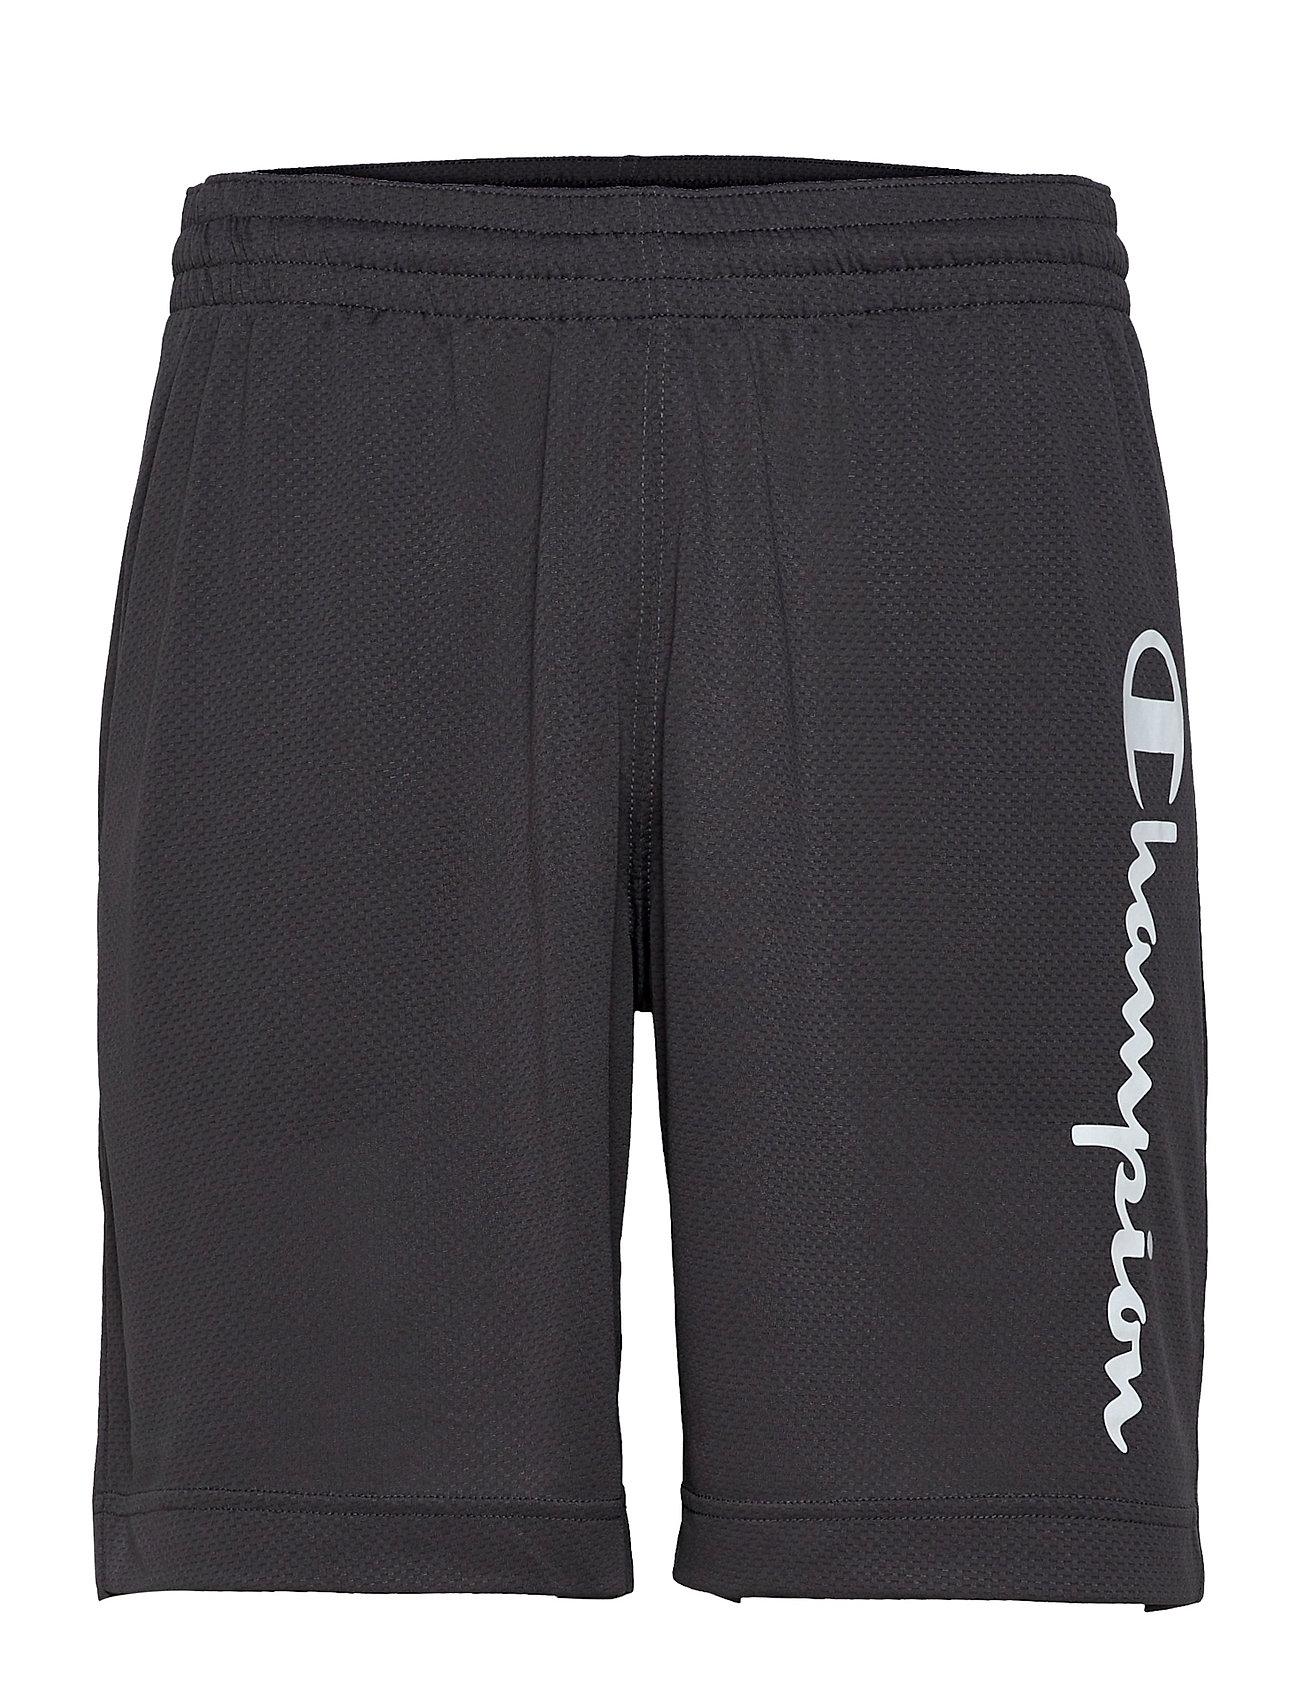 Bermuda Shorts Sport Shorts Sort Champion